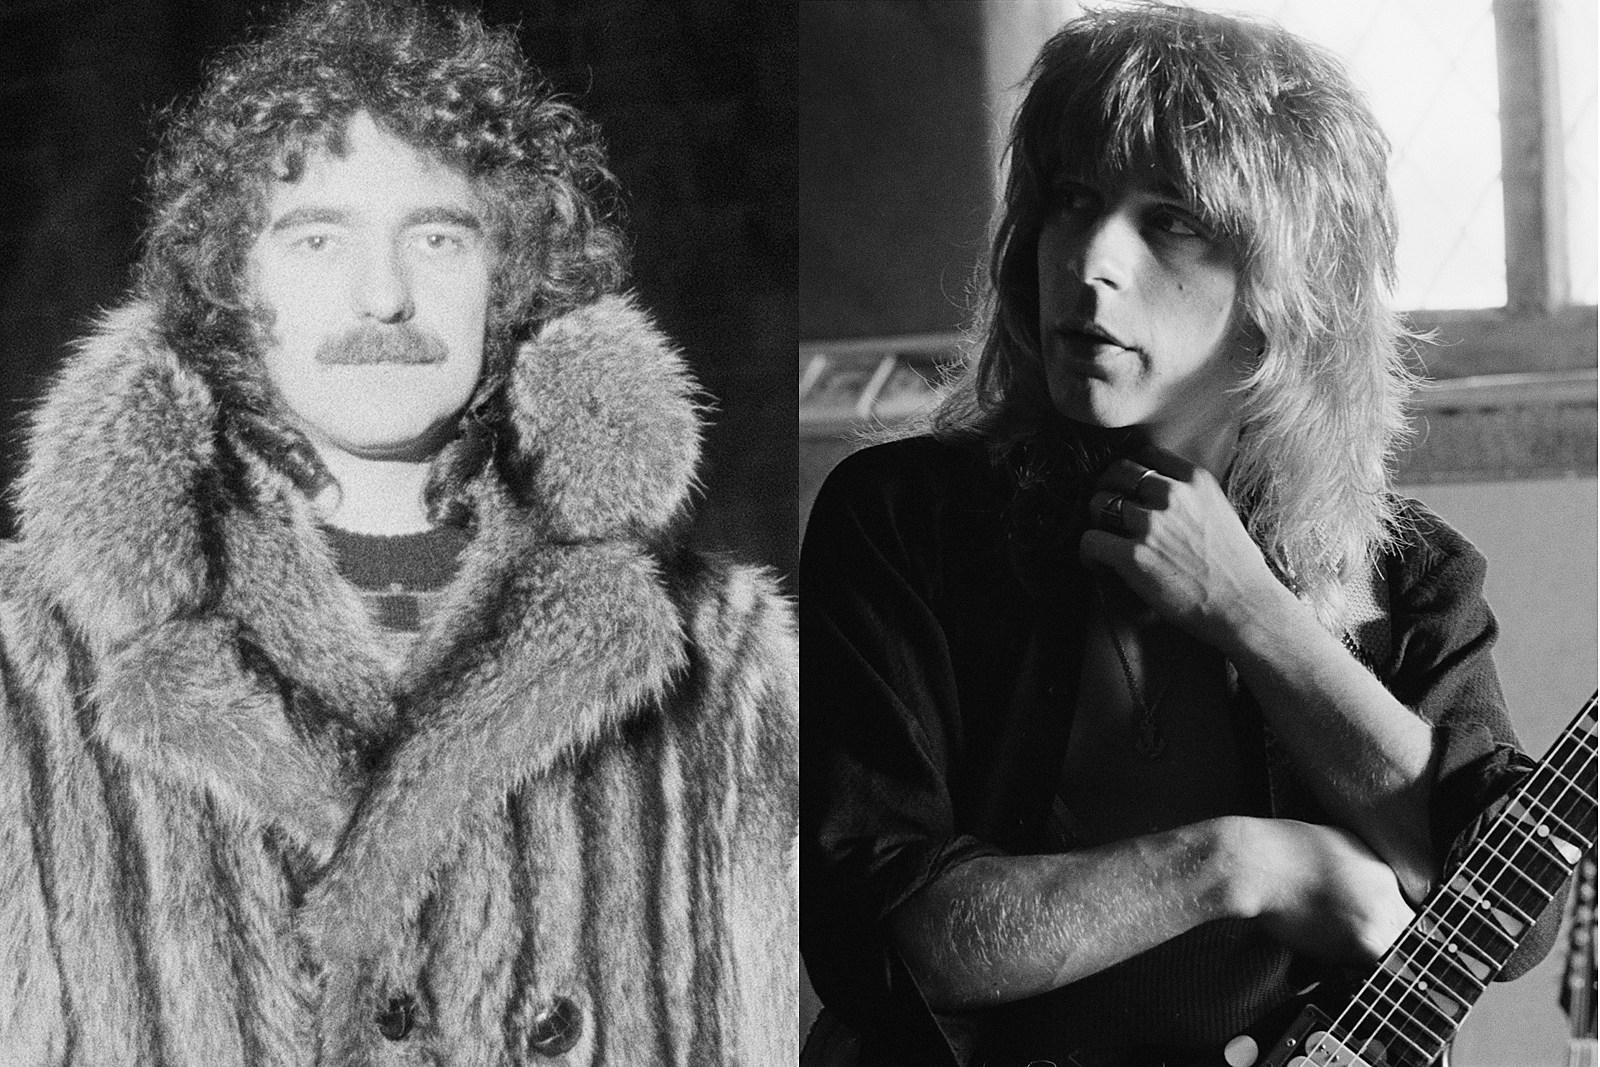 Black Sabbath 'Panicked' When They Heard About Randy Rhoads Crash